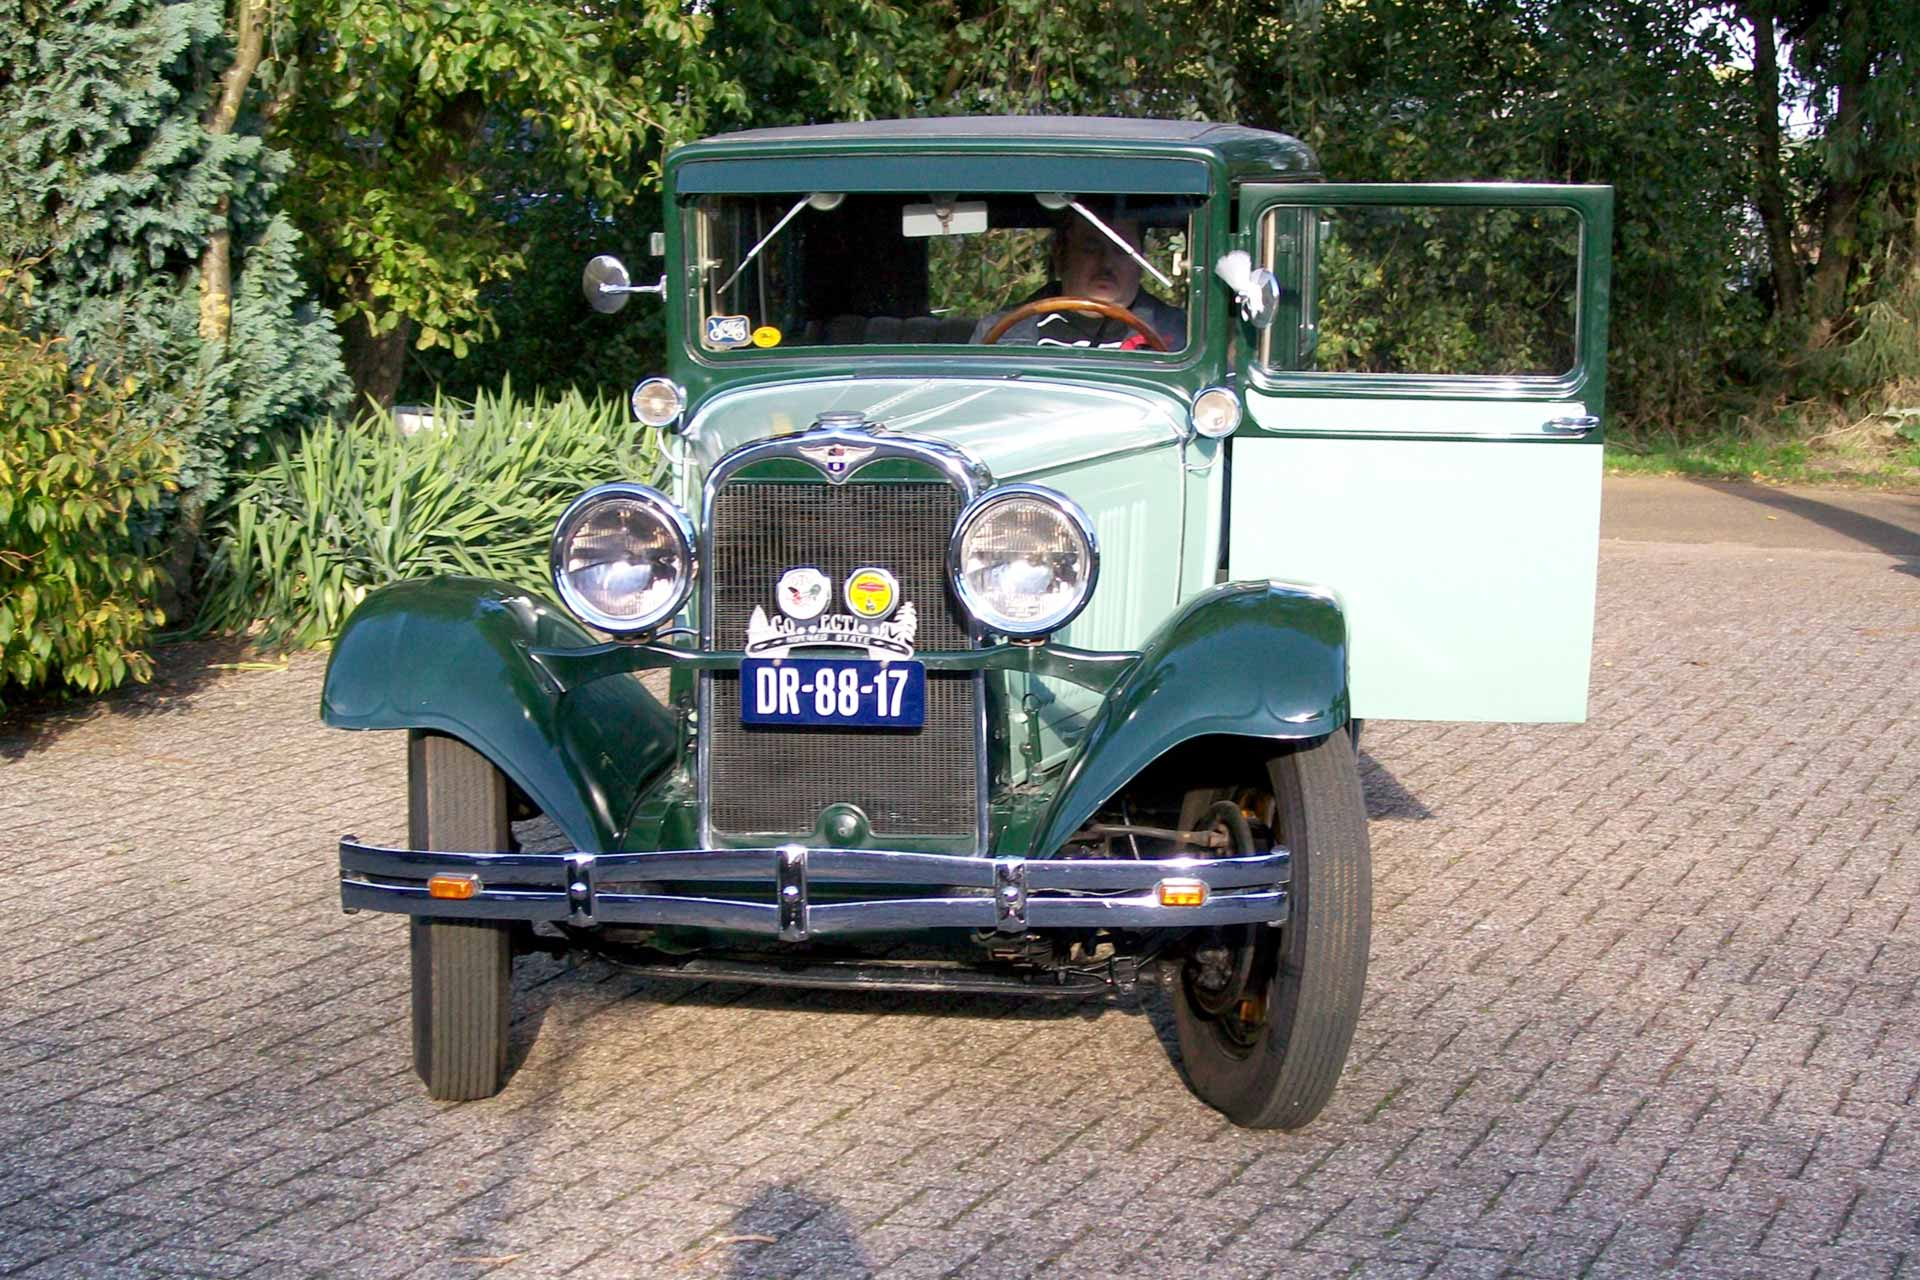 Masina de epoca Dodge de inchiriat pentru nunti